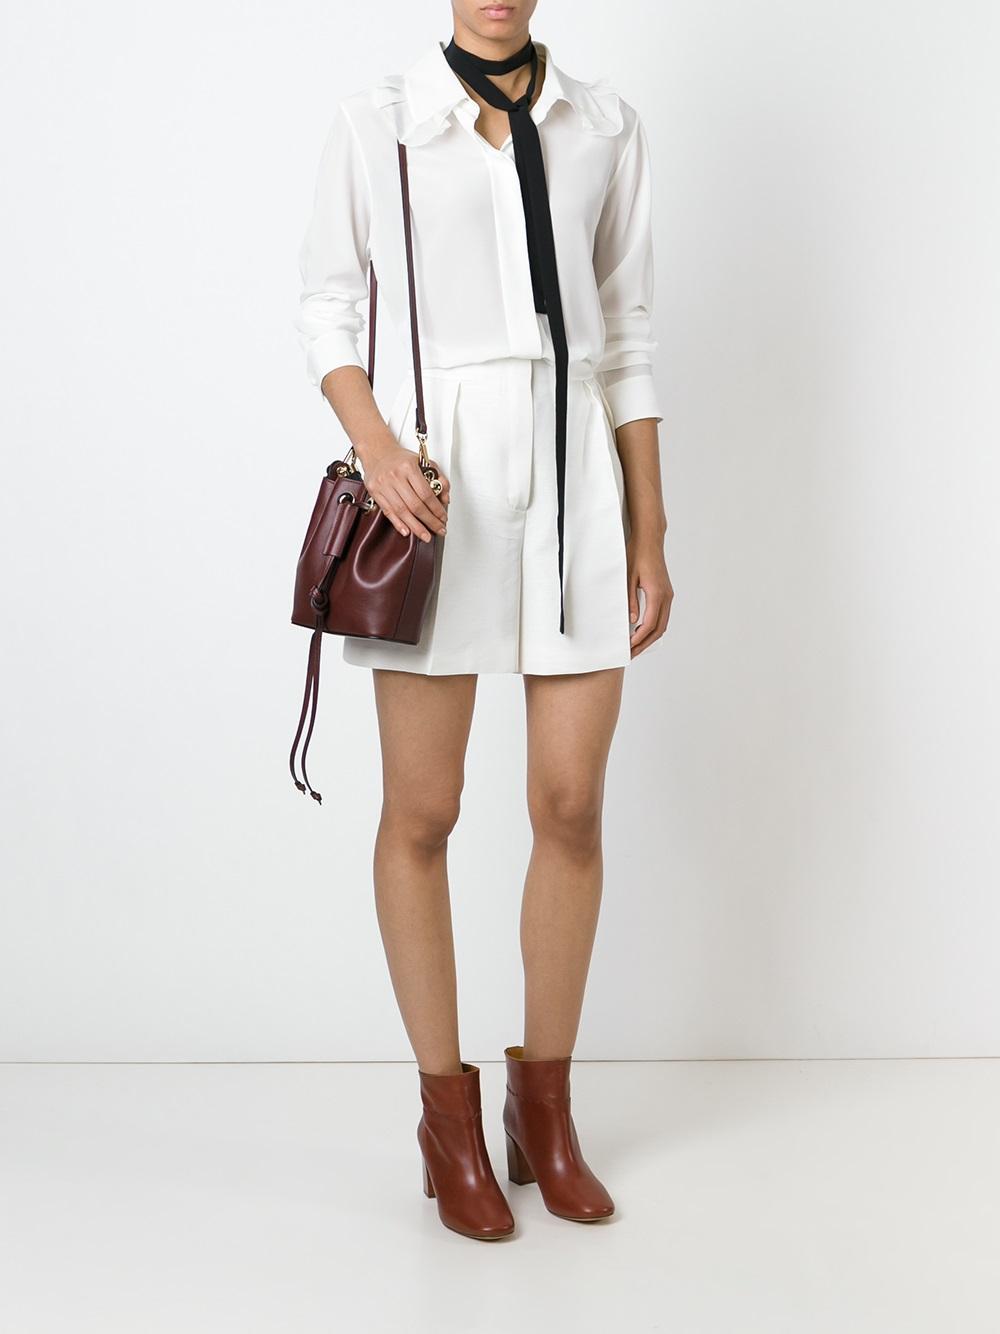 chloe handbags sale online - small gala bucket bag in smooth calfskin